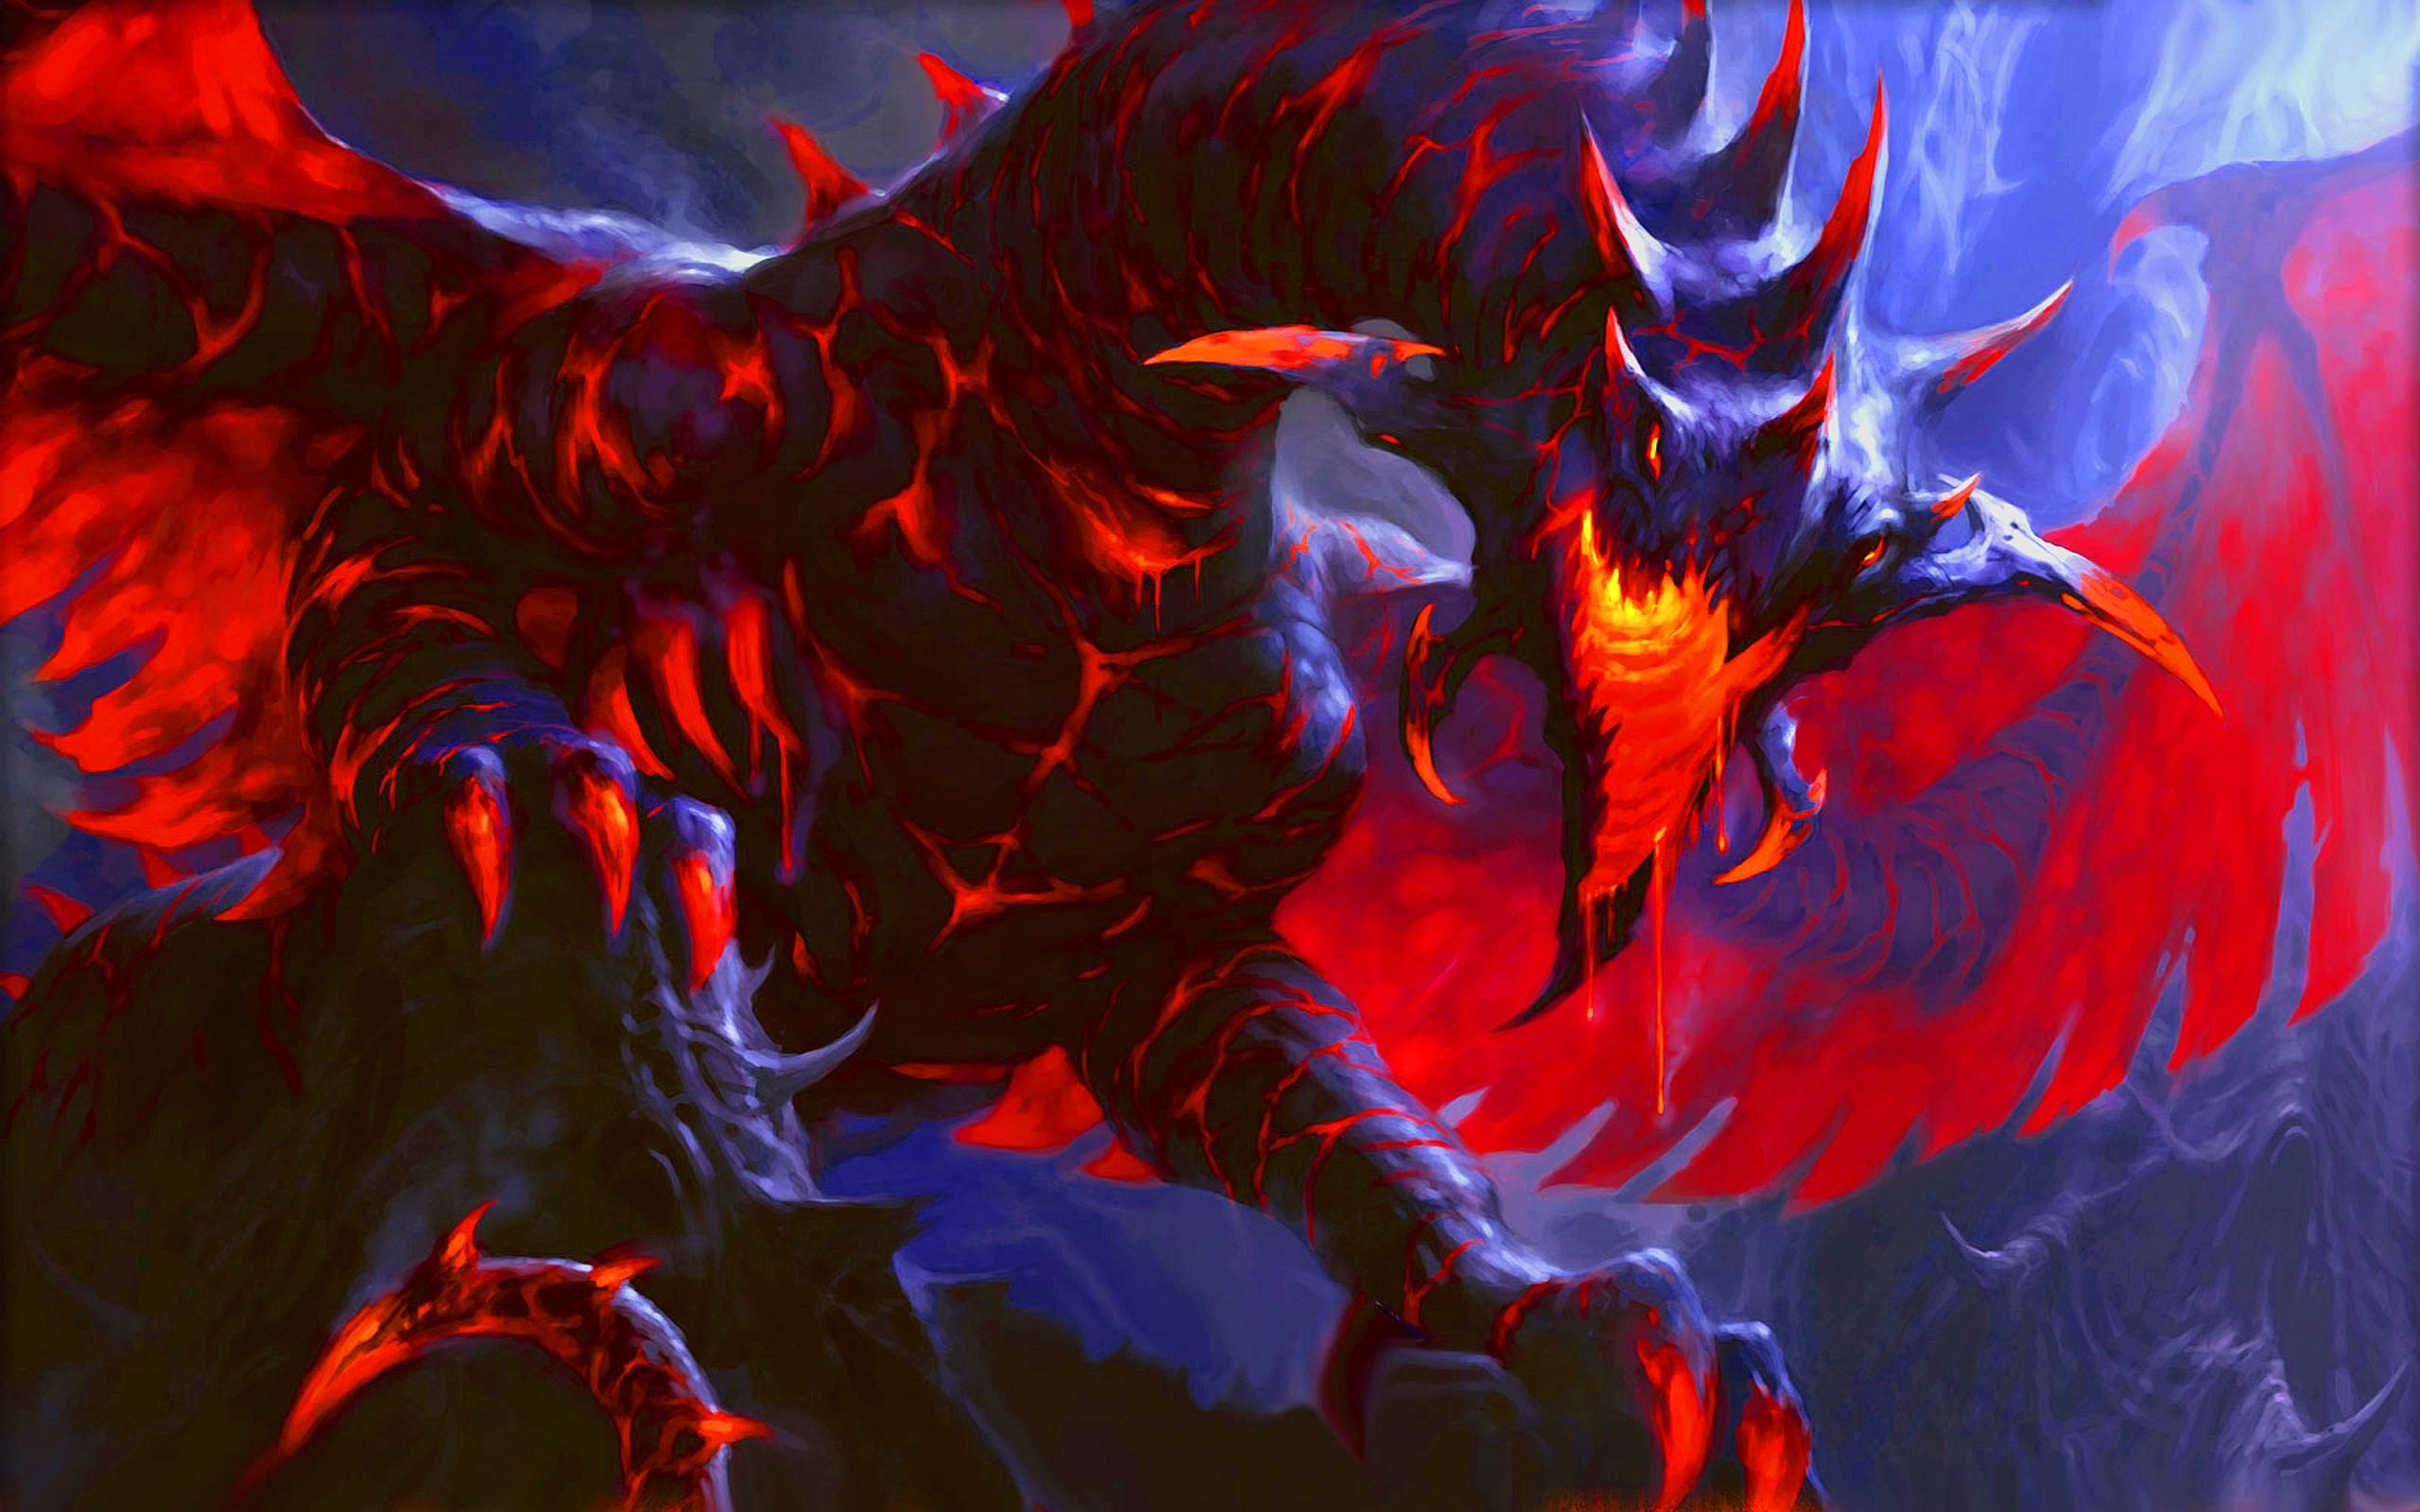 Red Fire Dragon Wallpaper 2560x1600